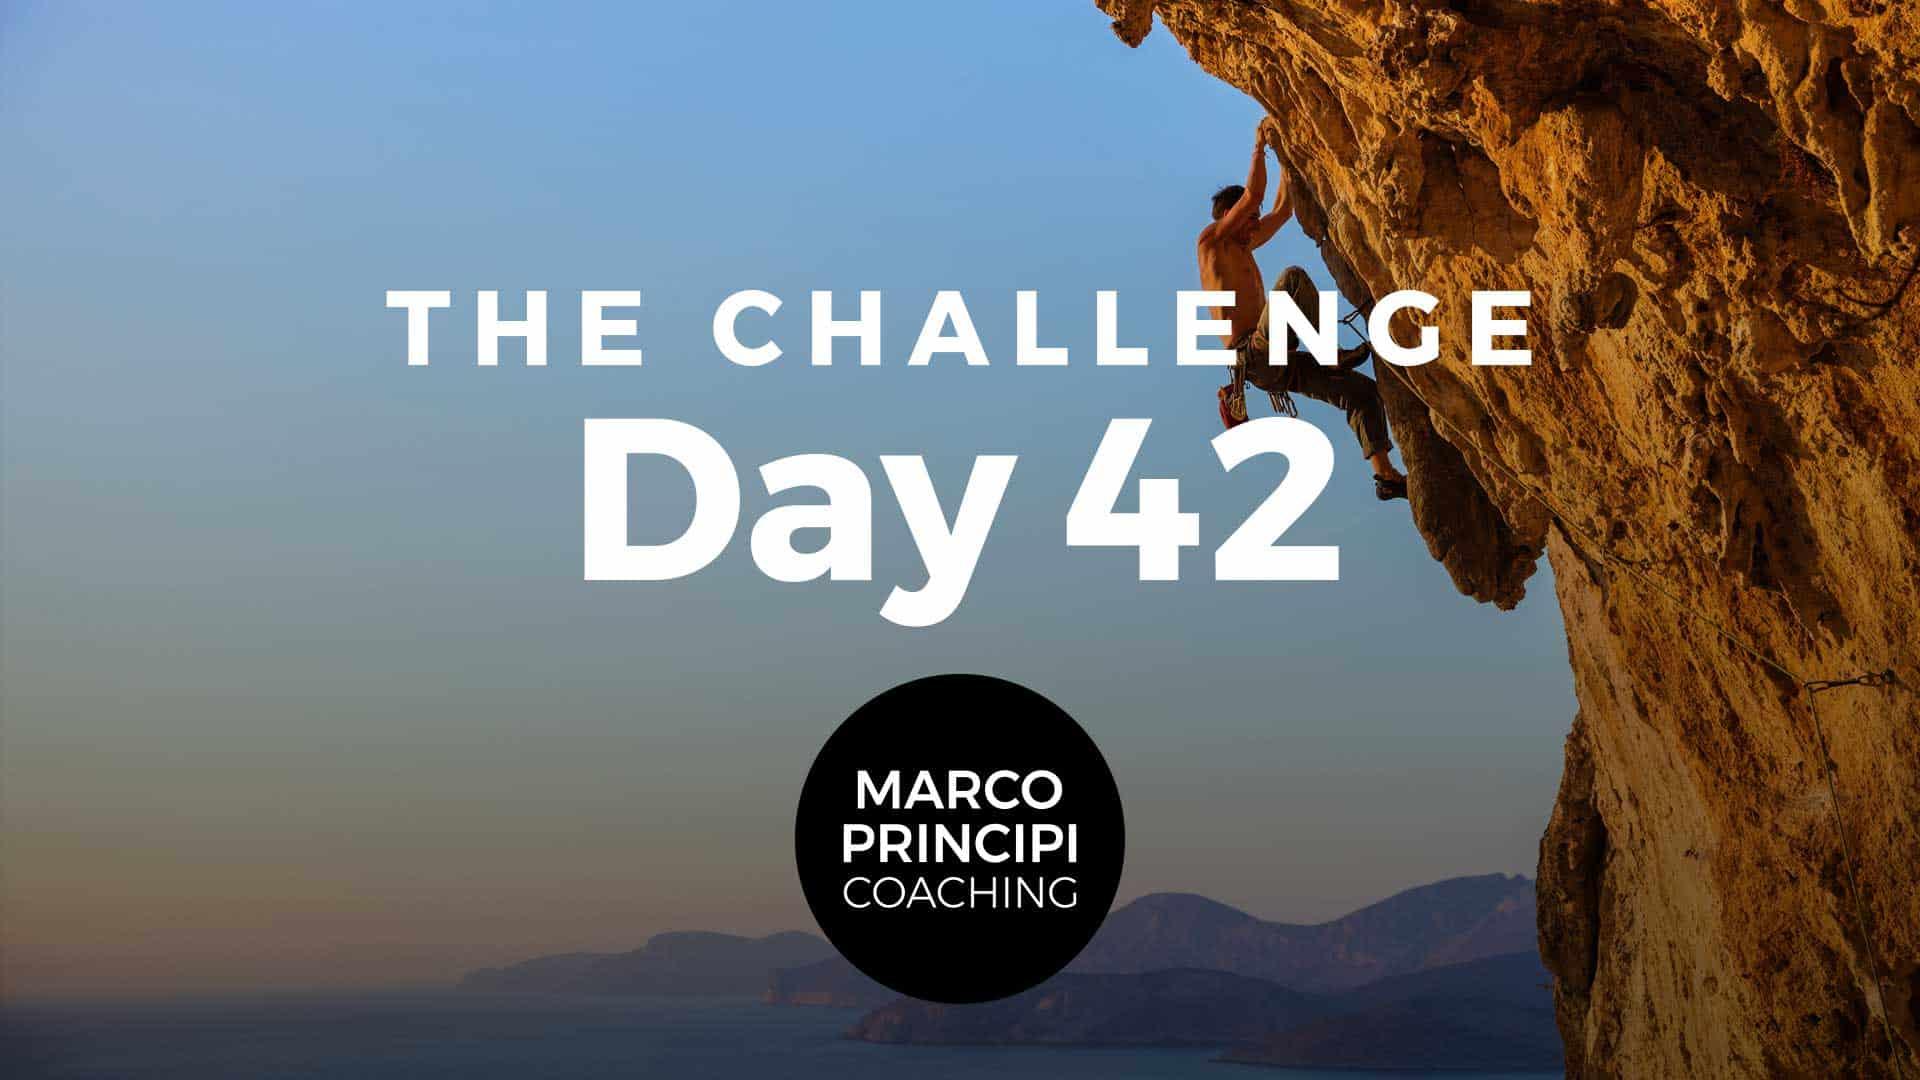 Marco Principi The Challenge Day 42